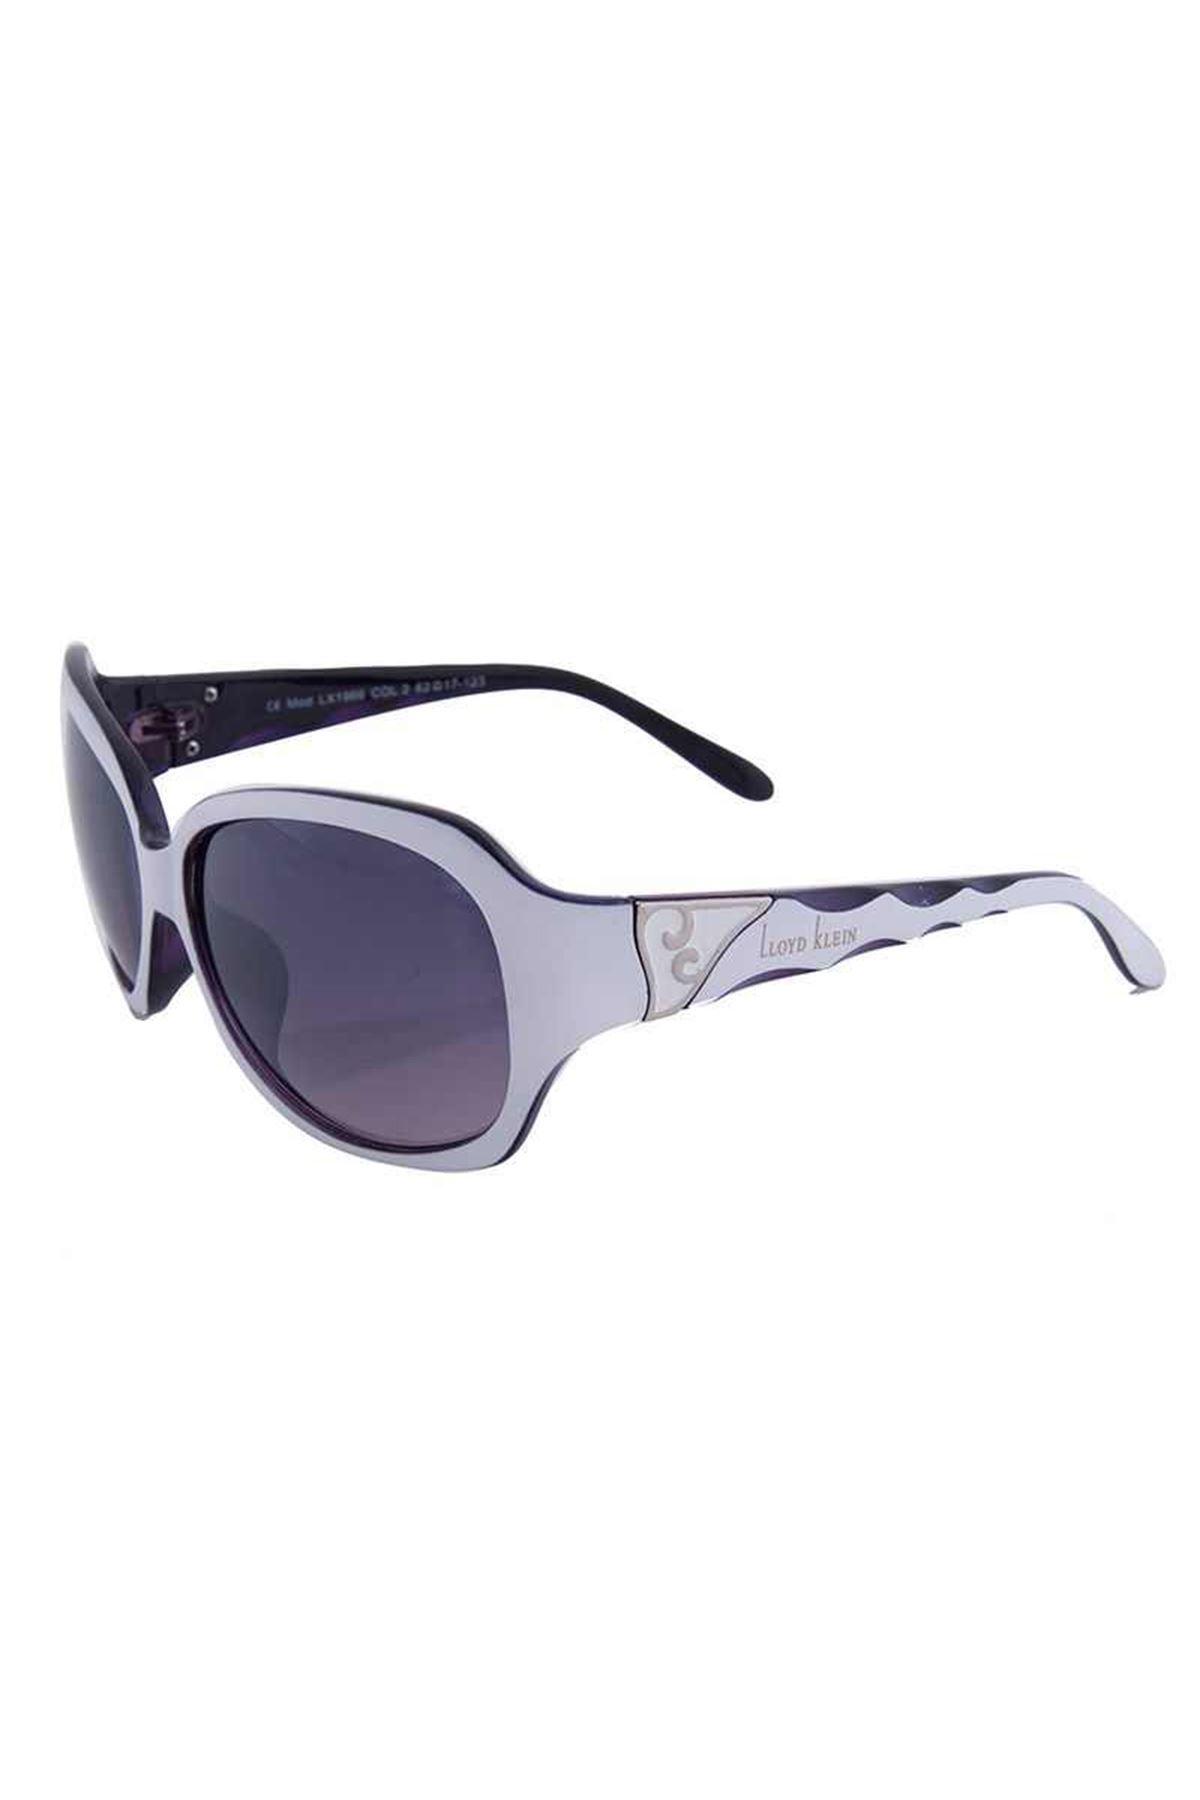 Lloyd Klein Güneş Gözlüğü 40A-72680